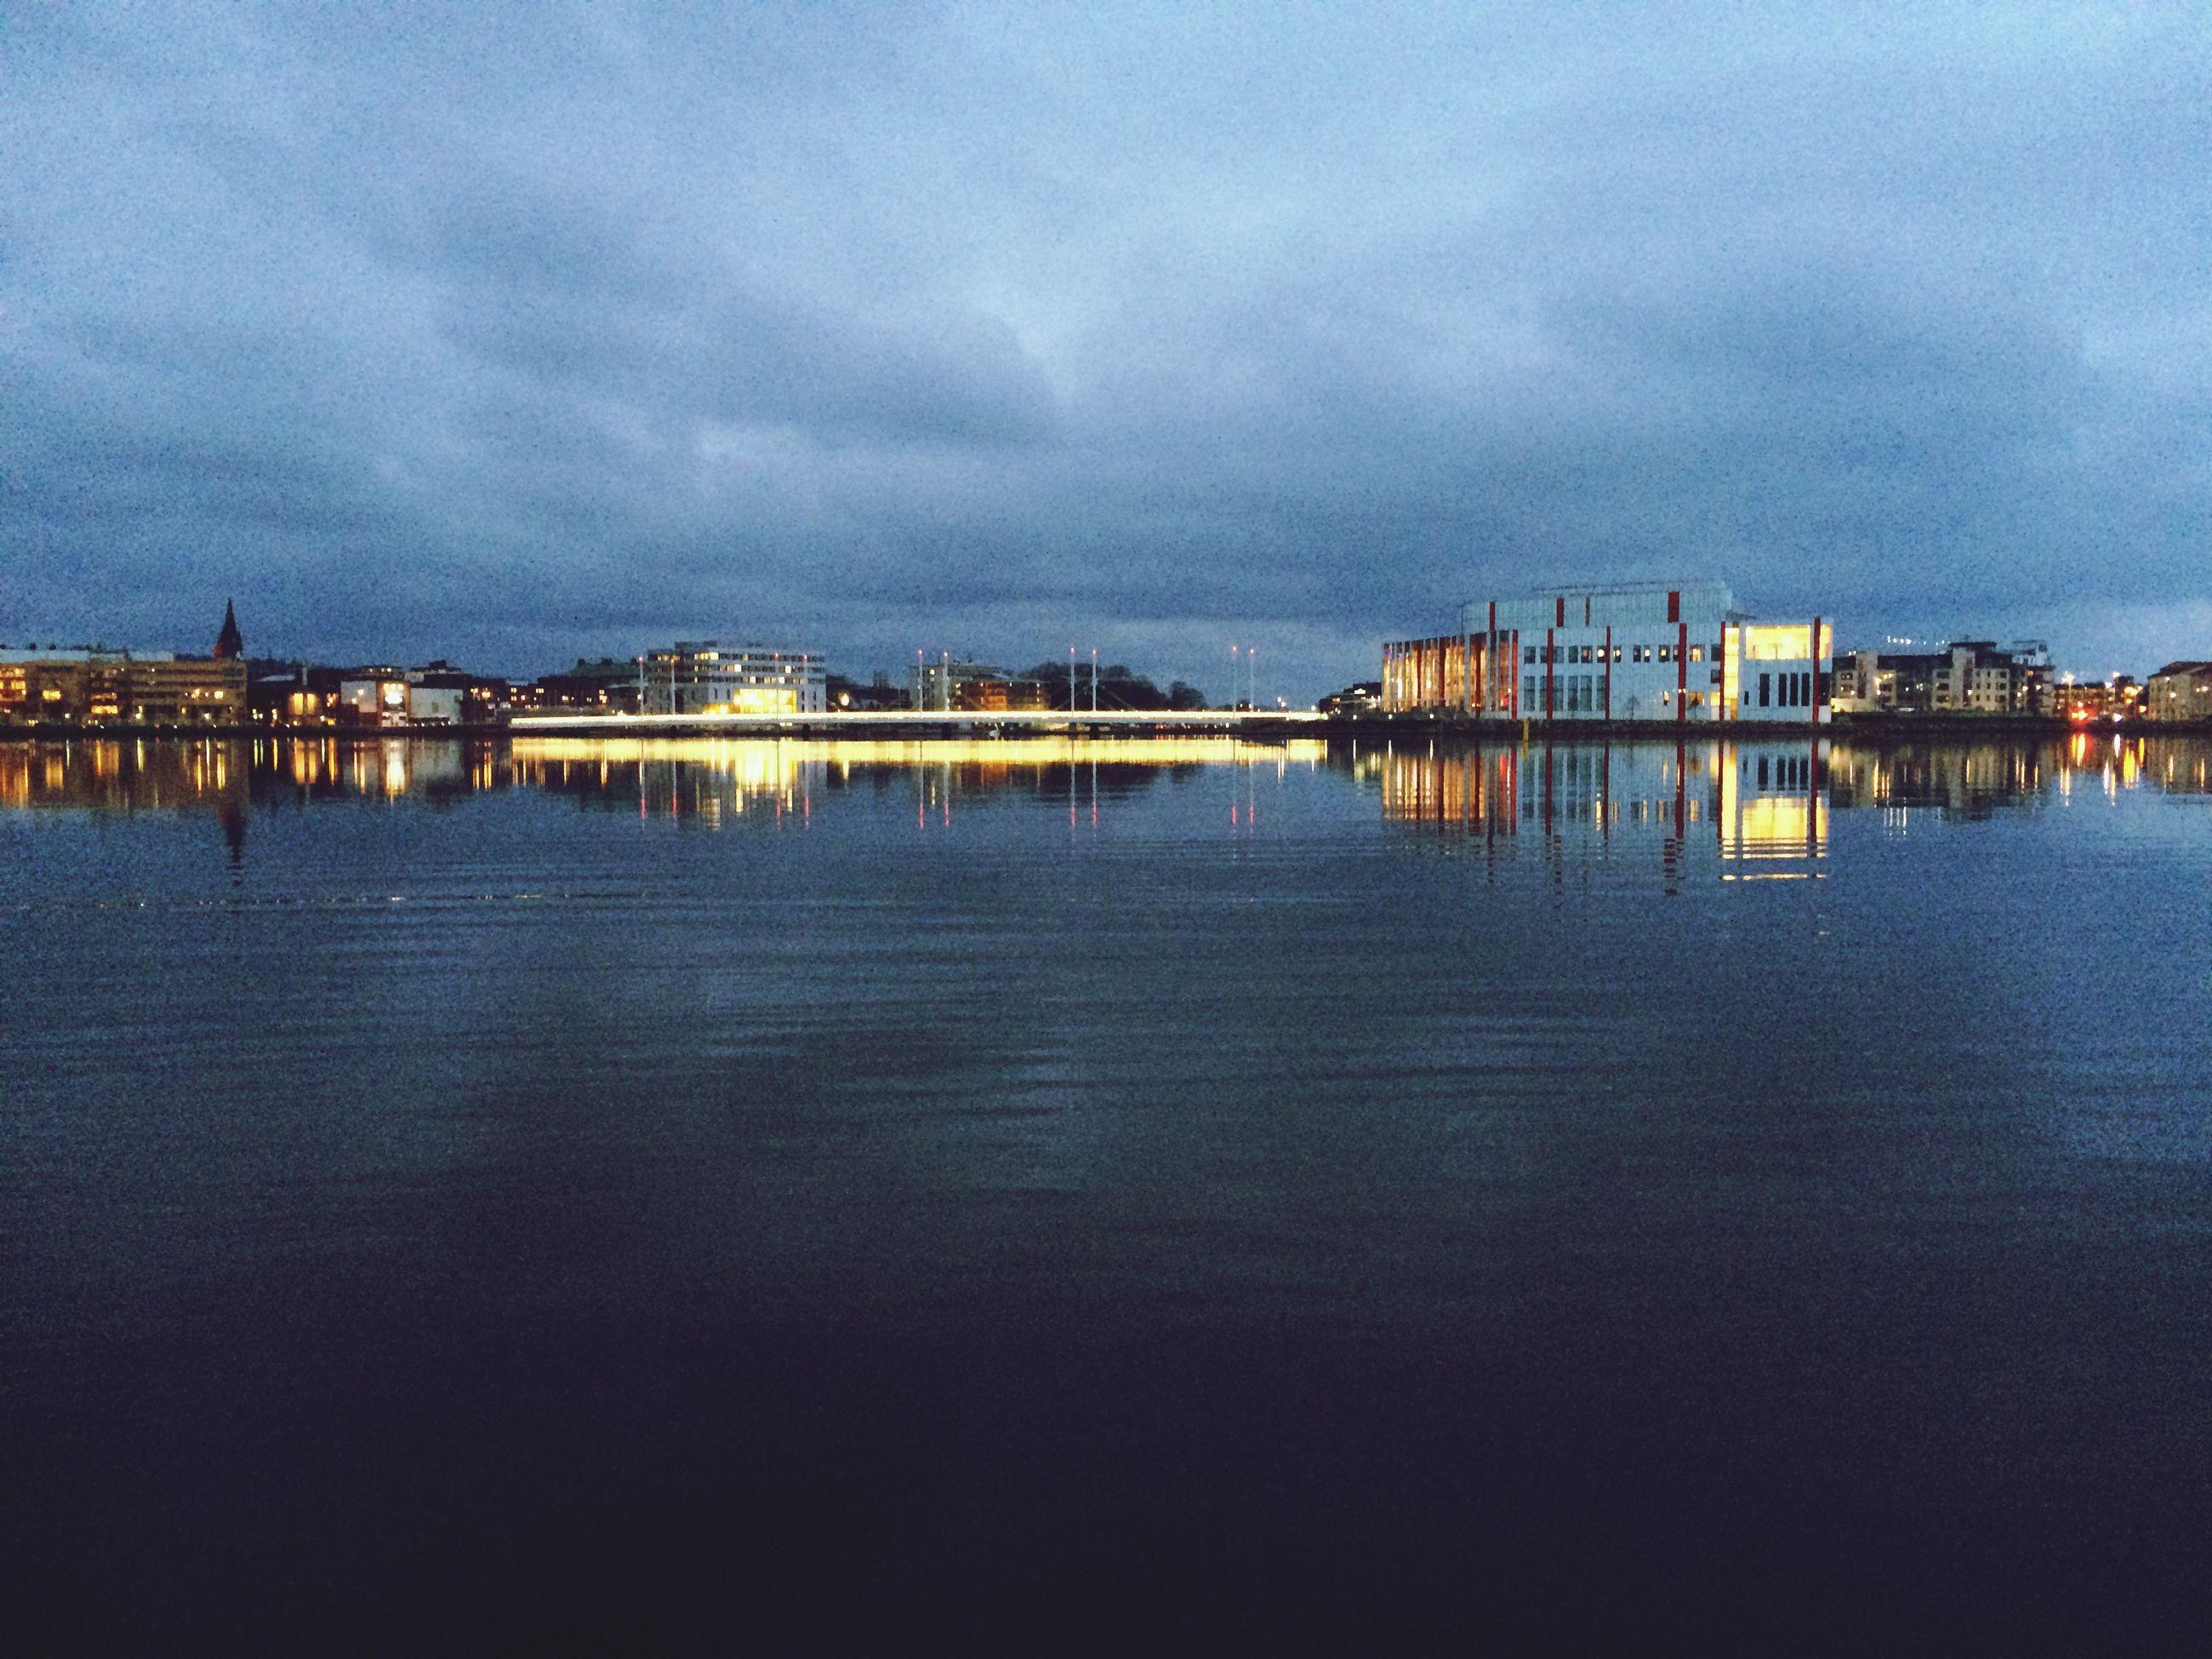 Illuminated city by sea against cloudy sky